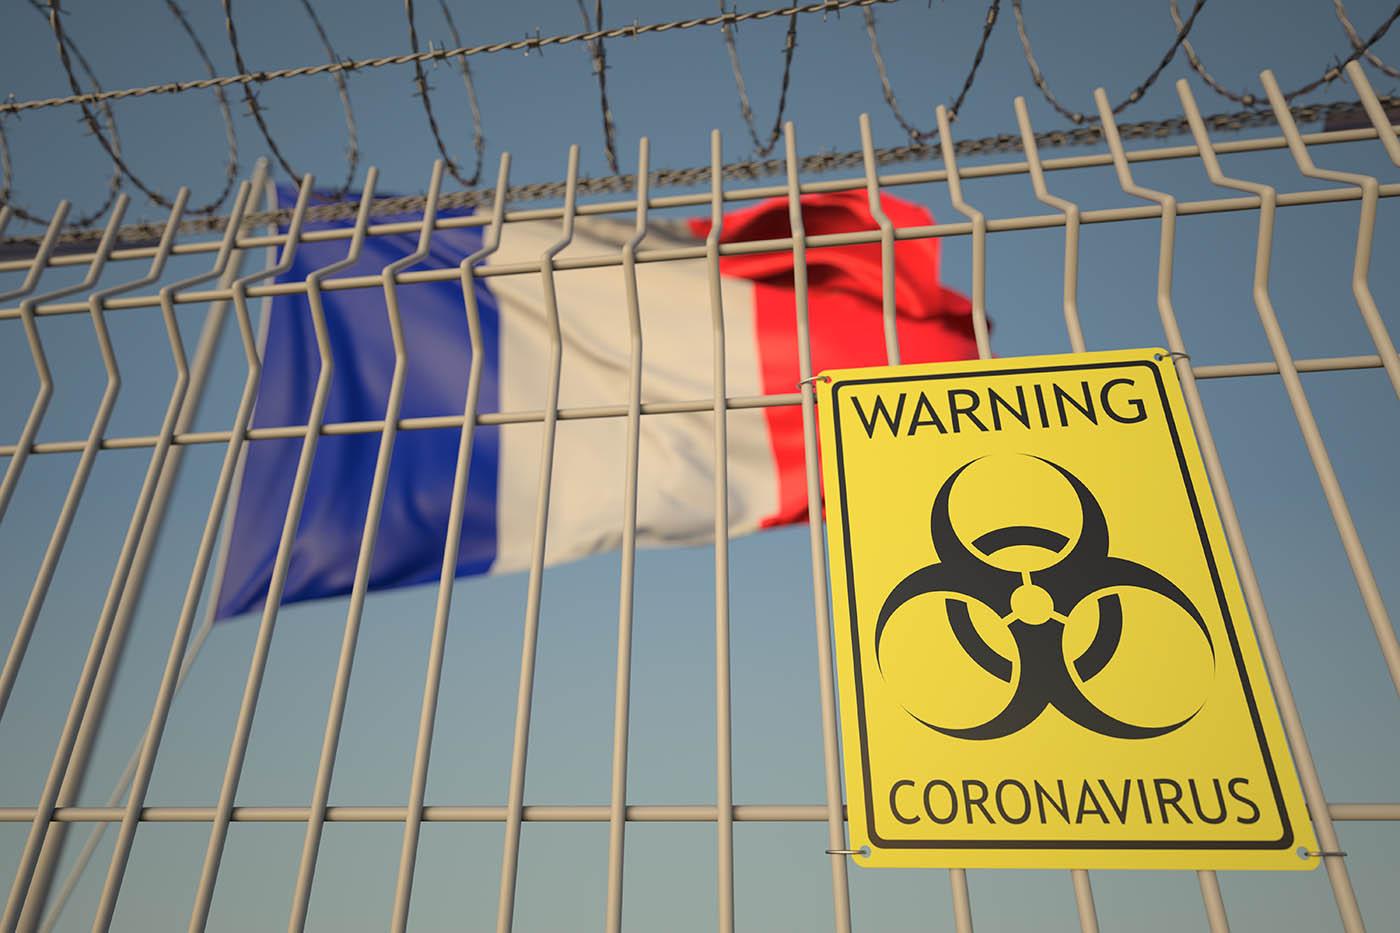 French flag behind bars with coronavirus warning sign